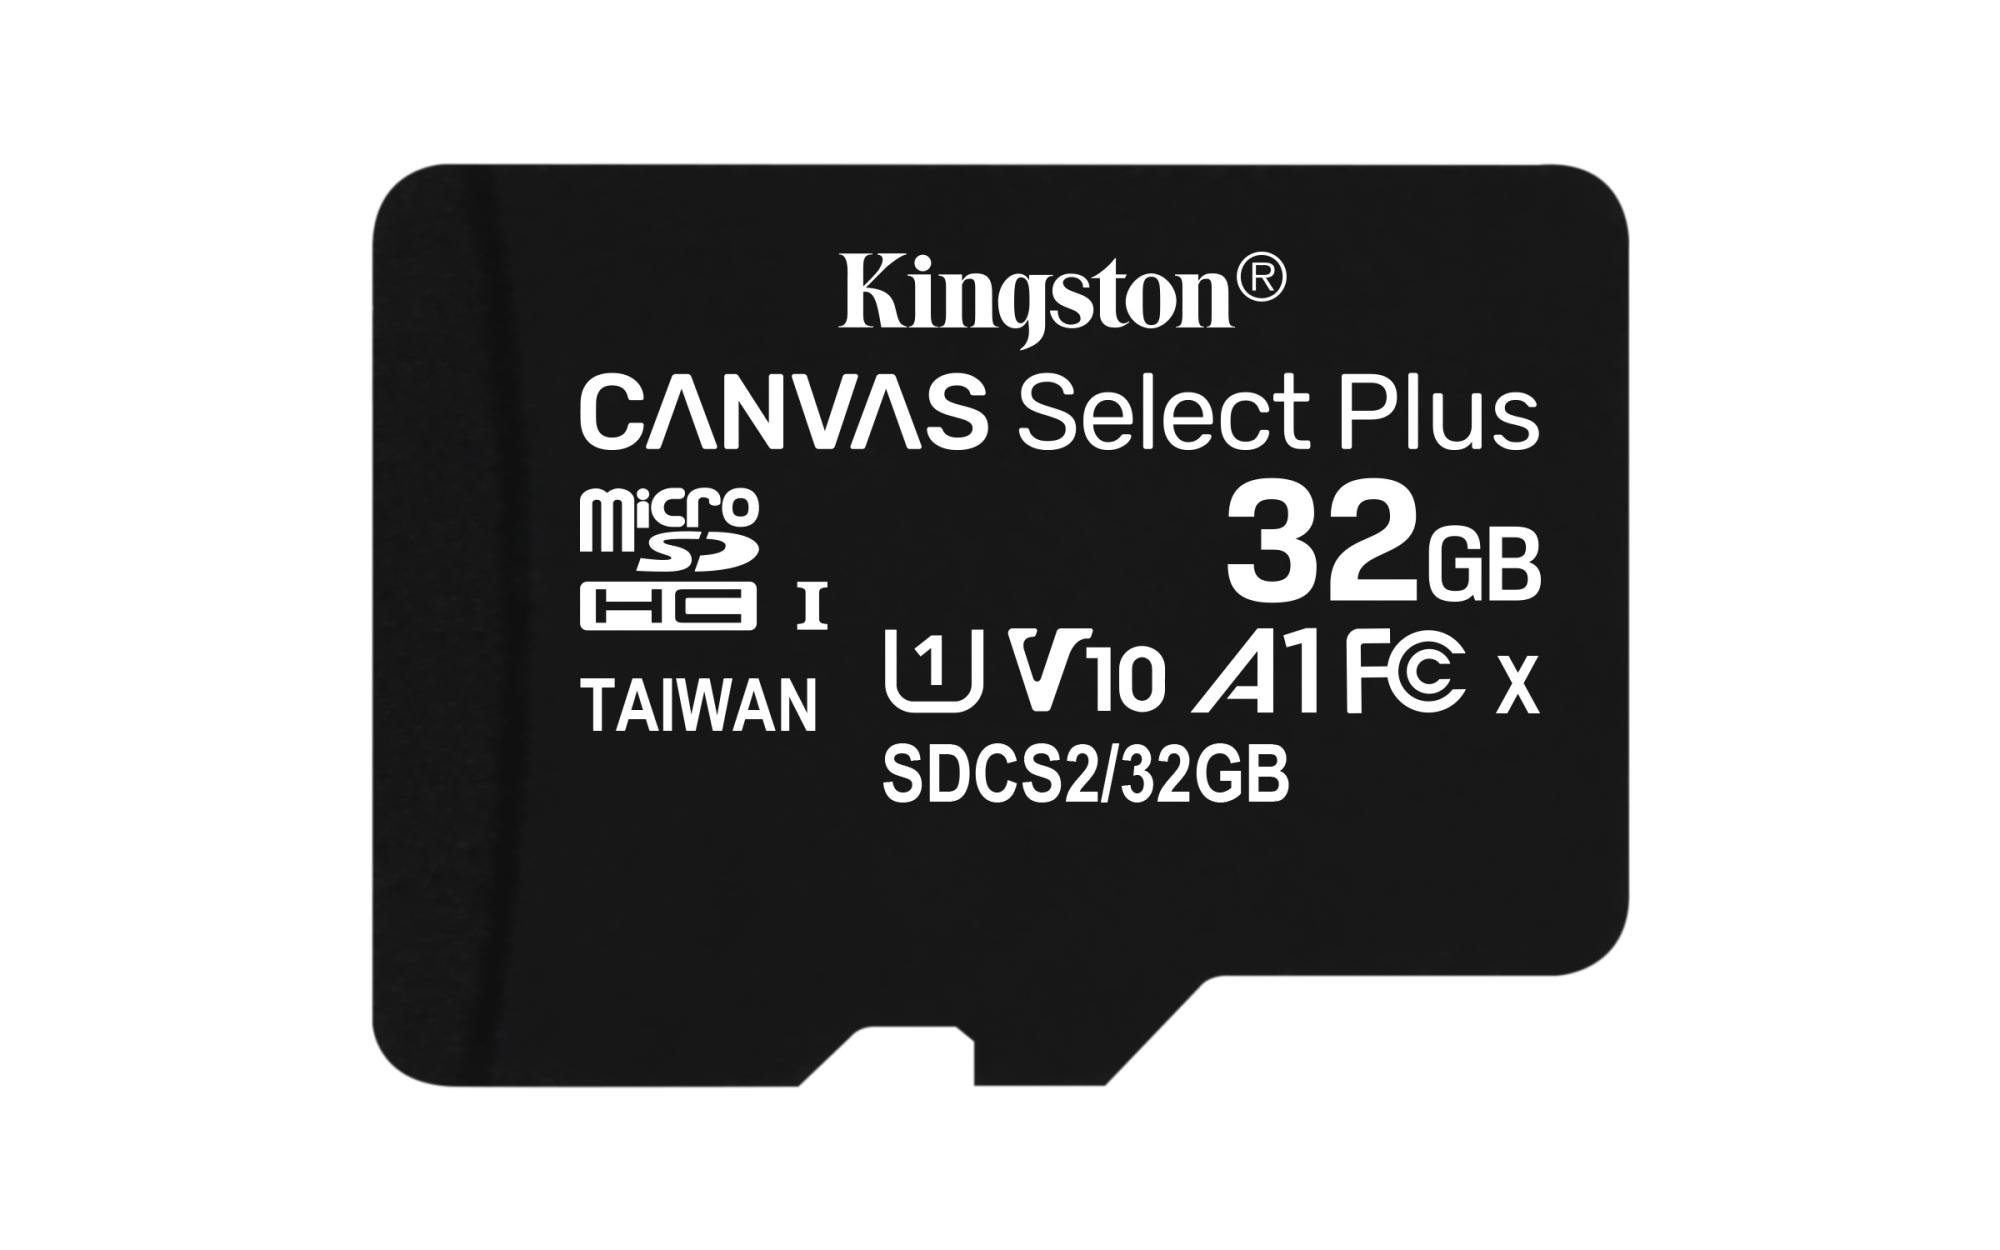 CANVAS SELECT PLUS MEMORIA FLASH 32 GB MICROSDHC CLASE 10 UHS-I